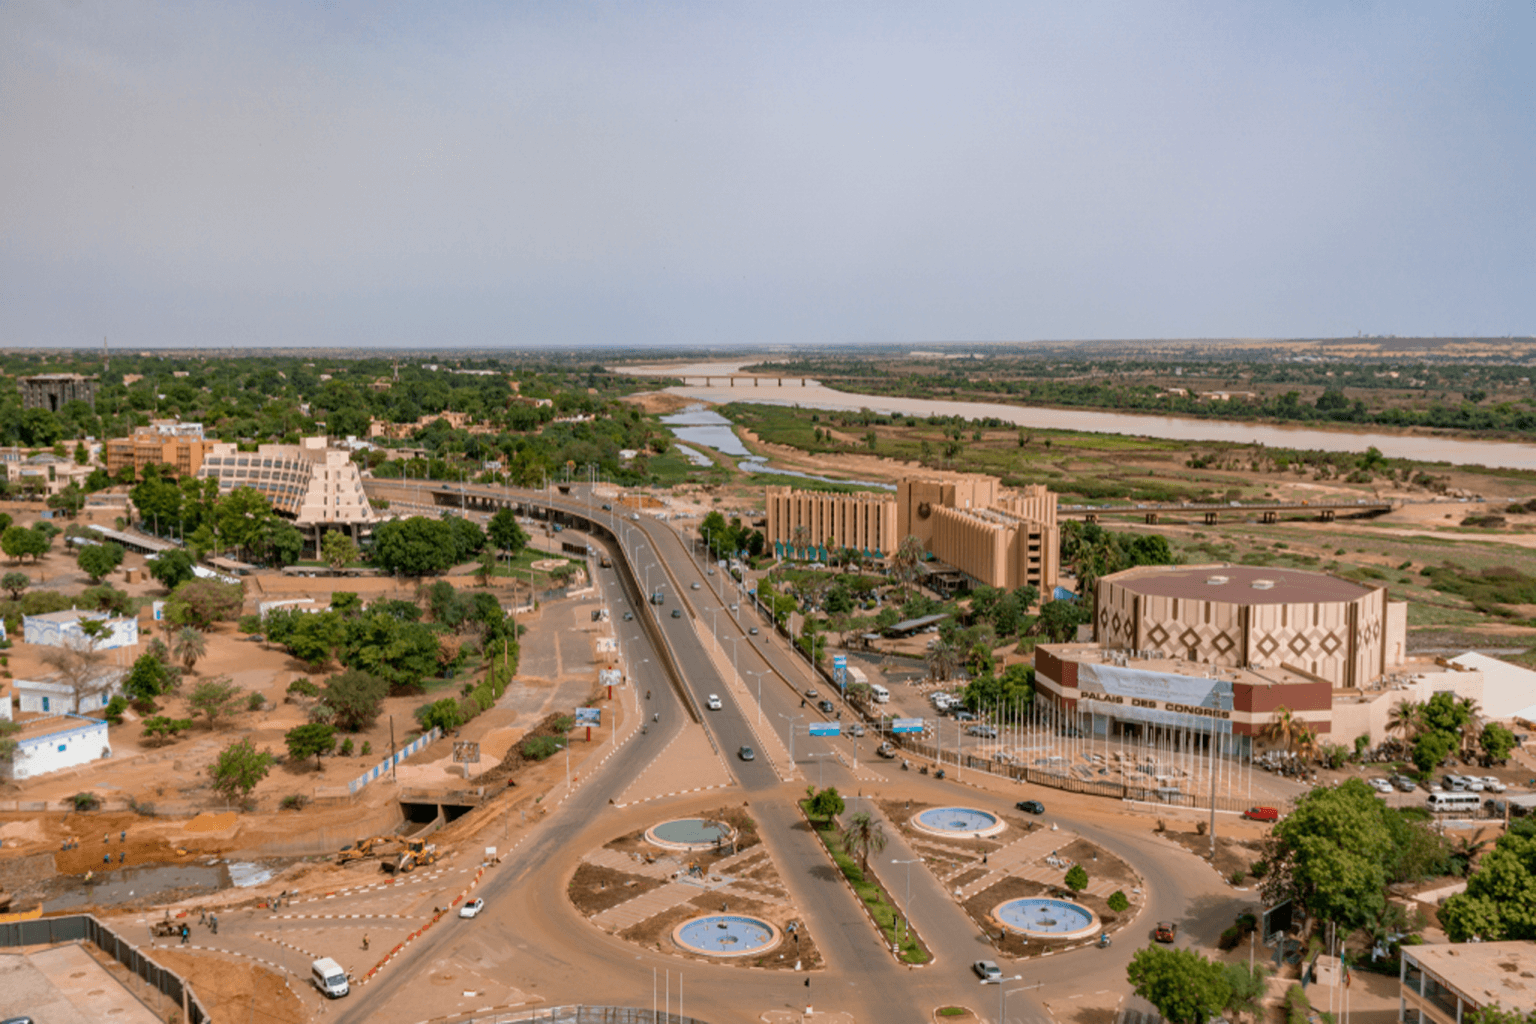 Niger city